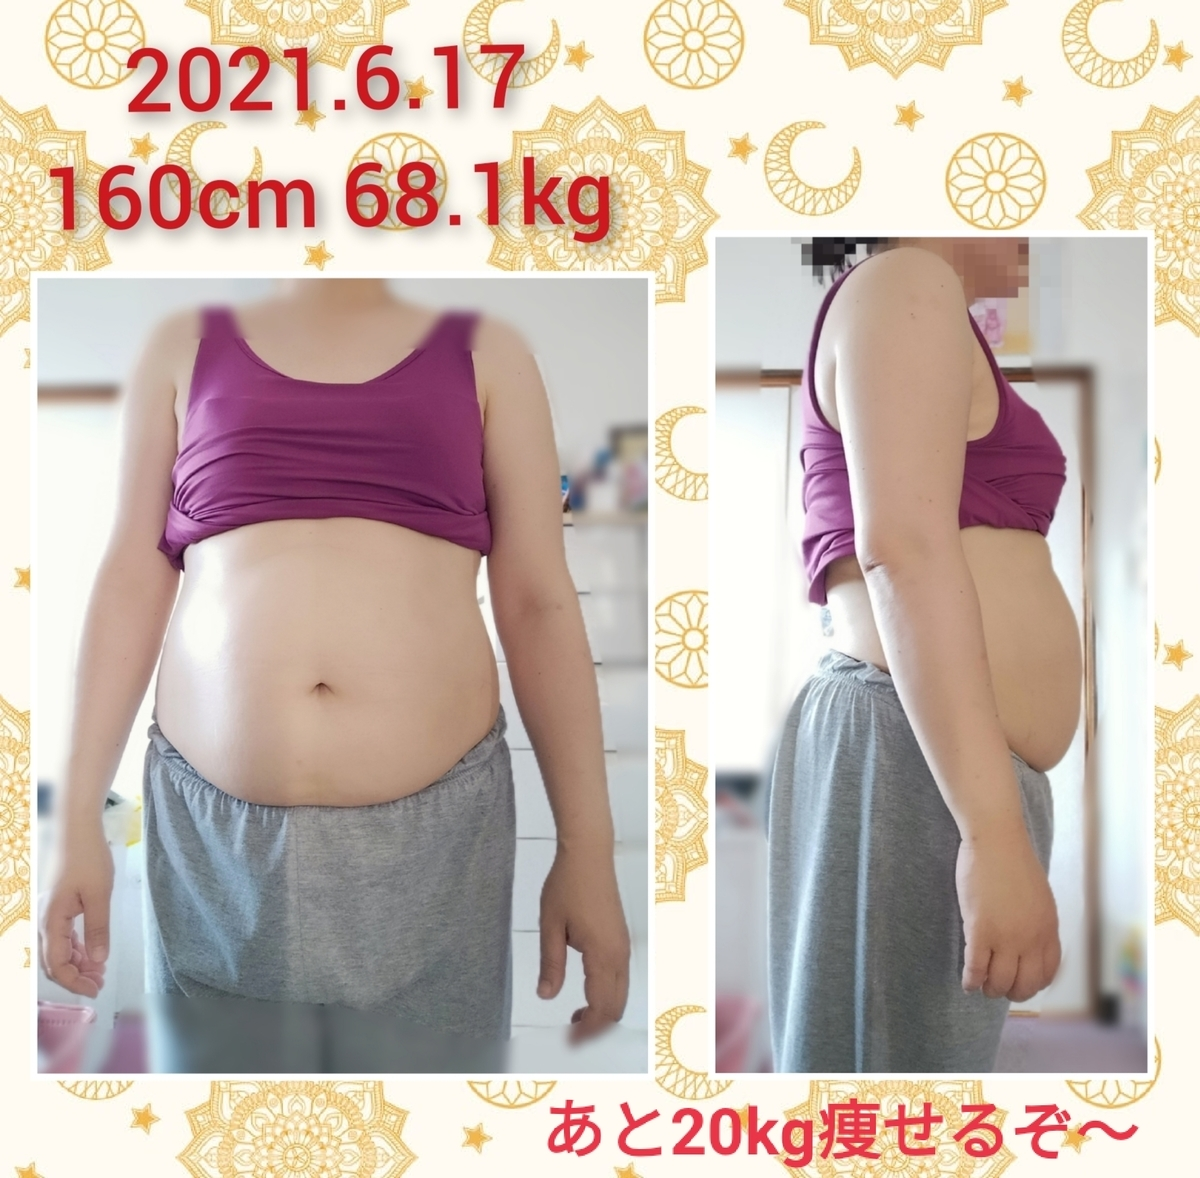 f:id:inaho30:20210620170003j:plain